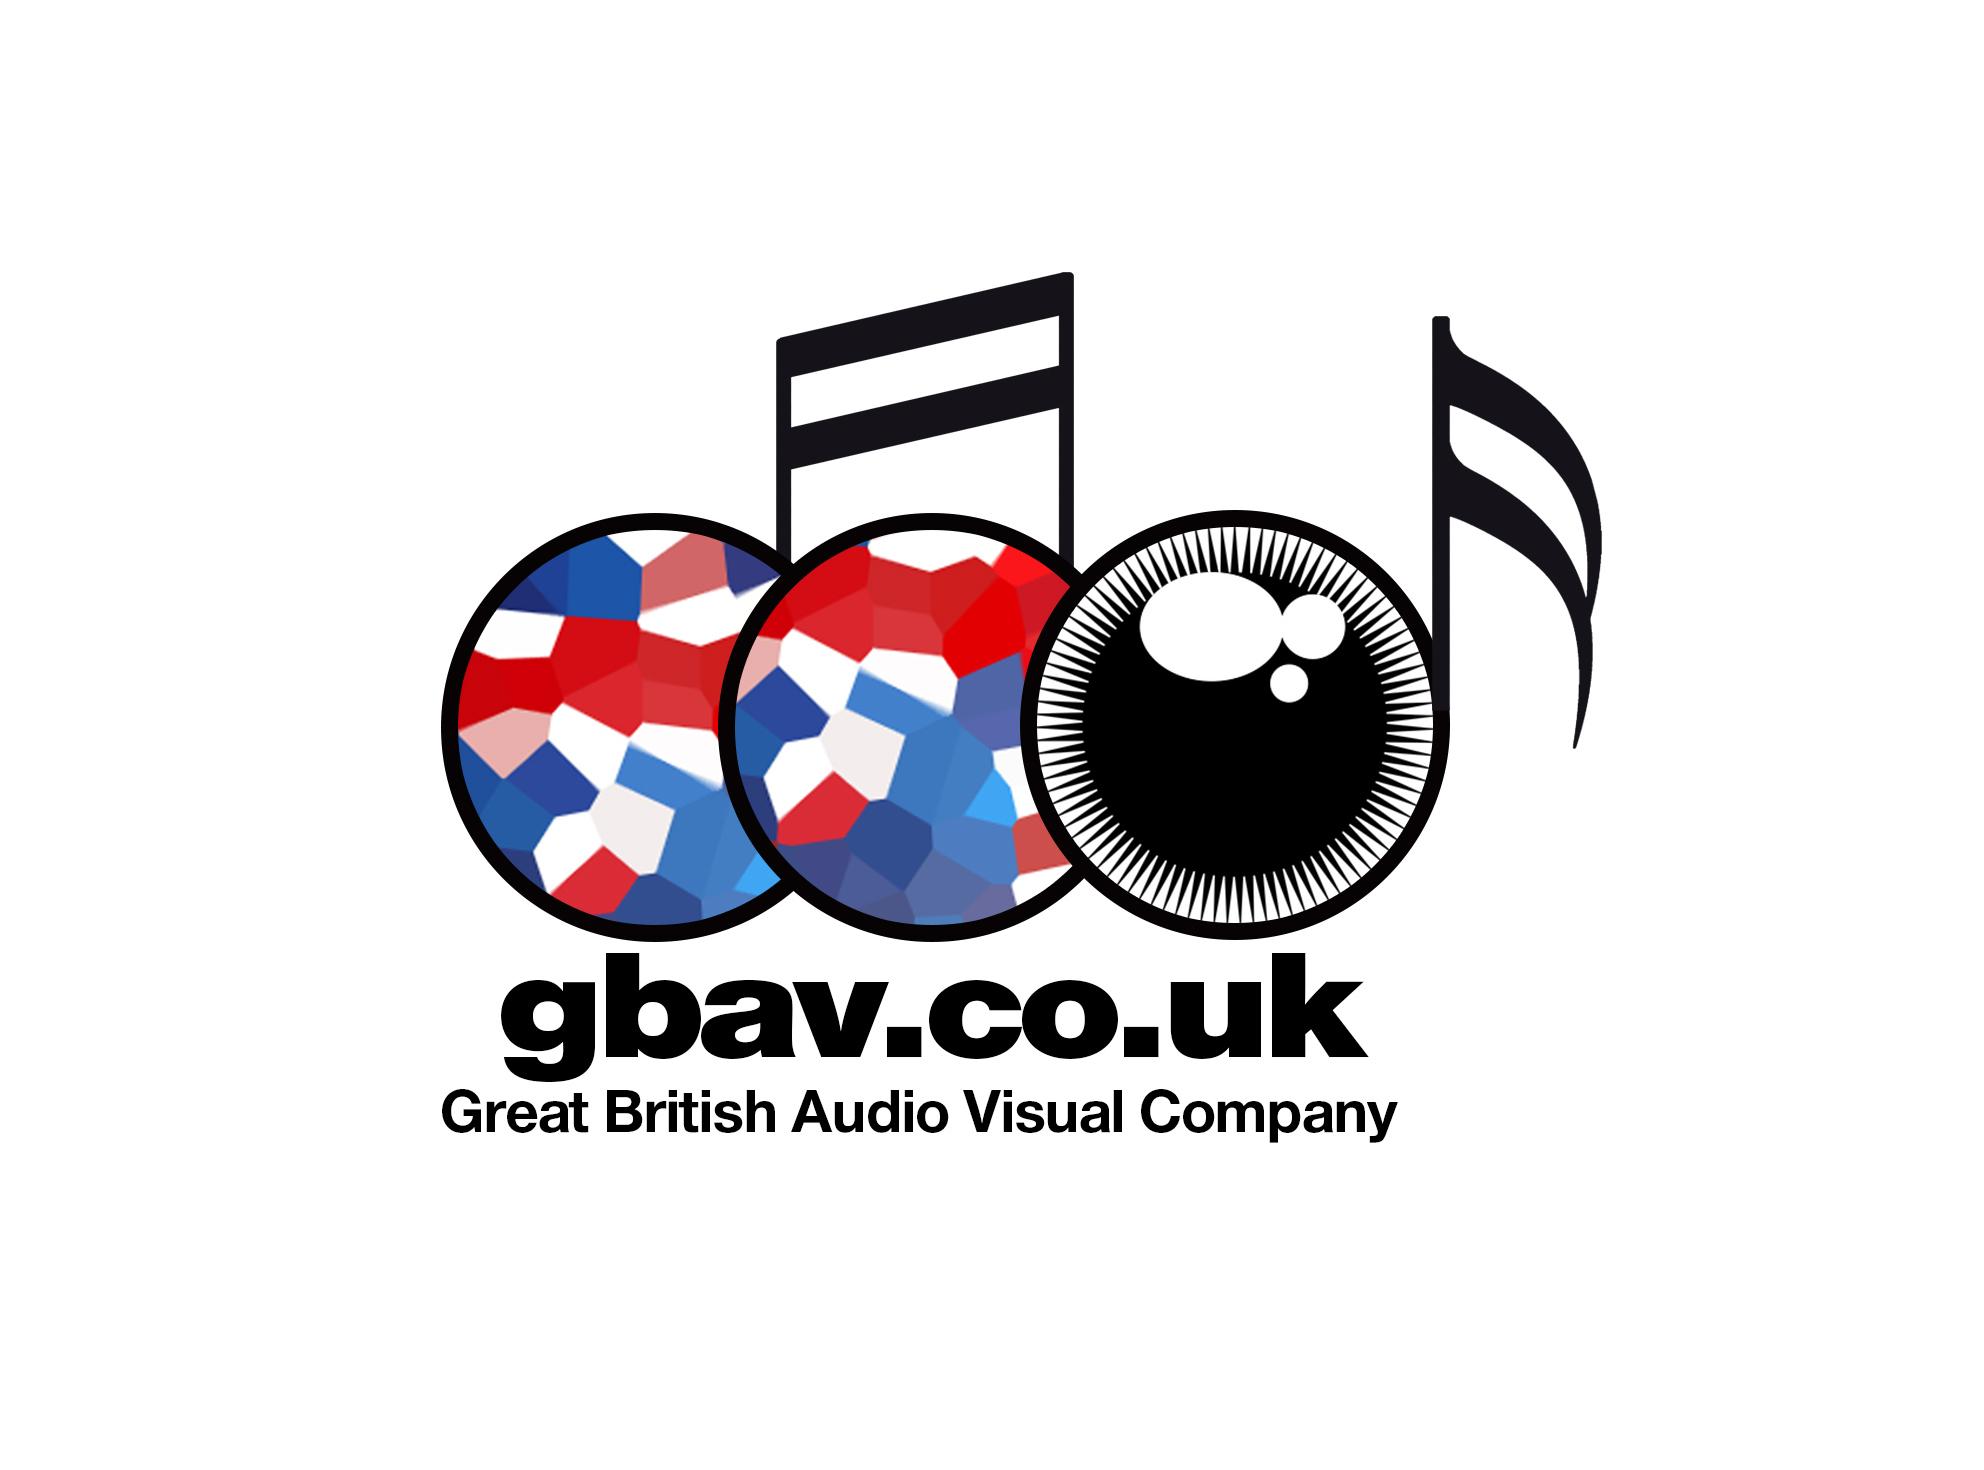 The Great British Audio Visual Company